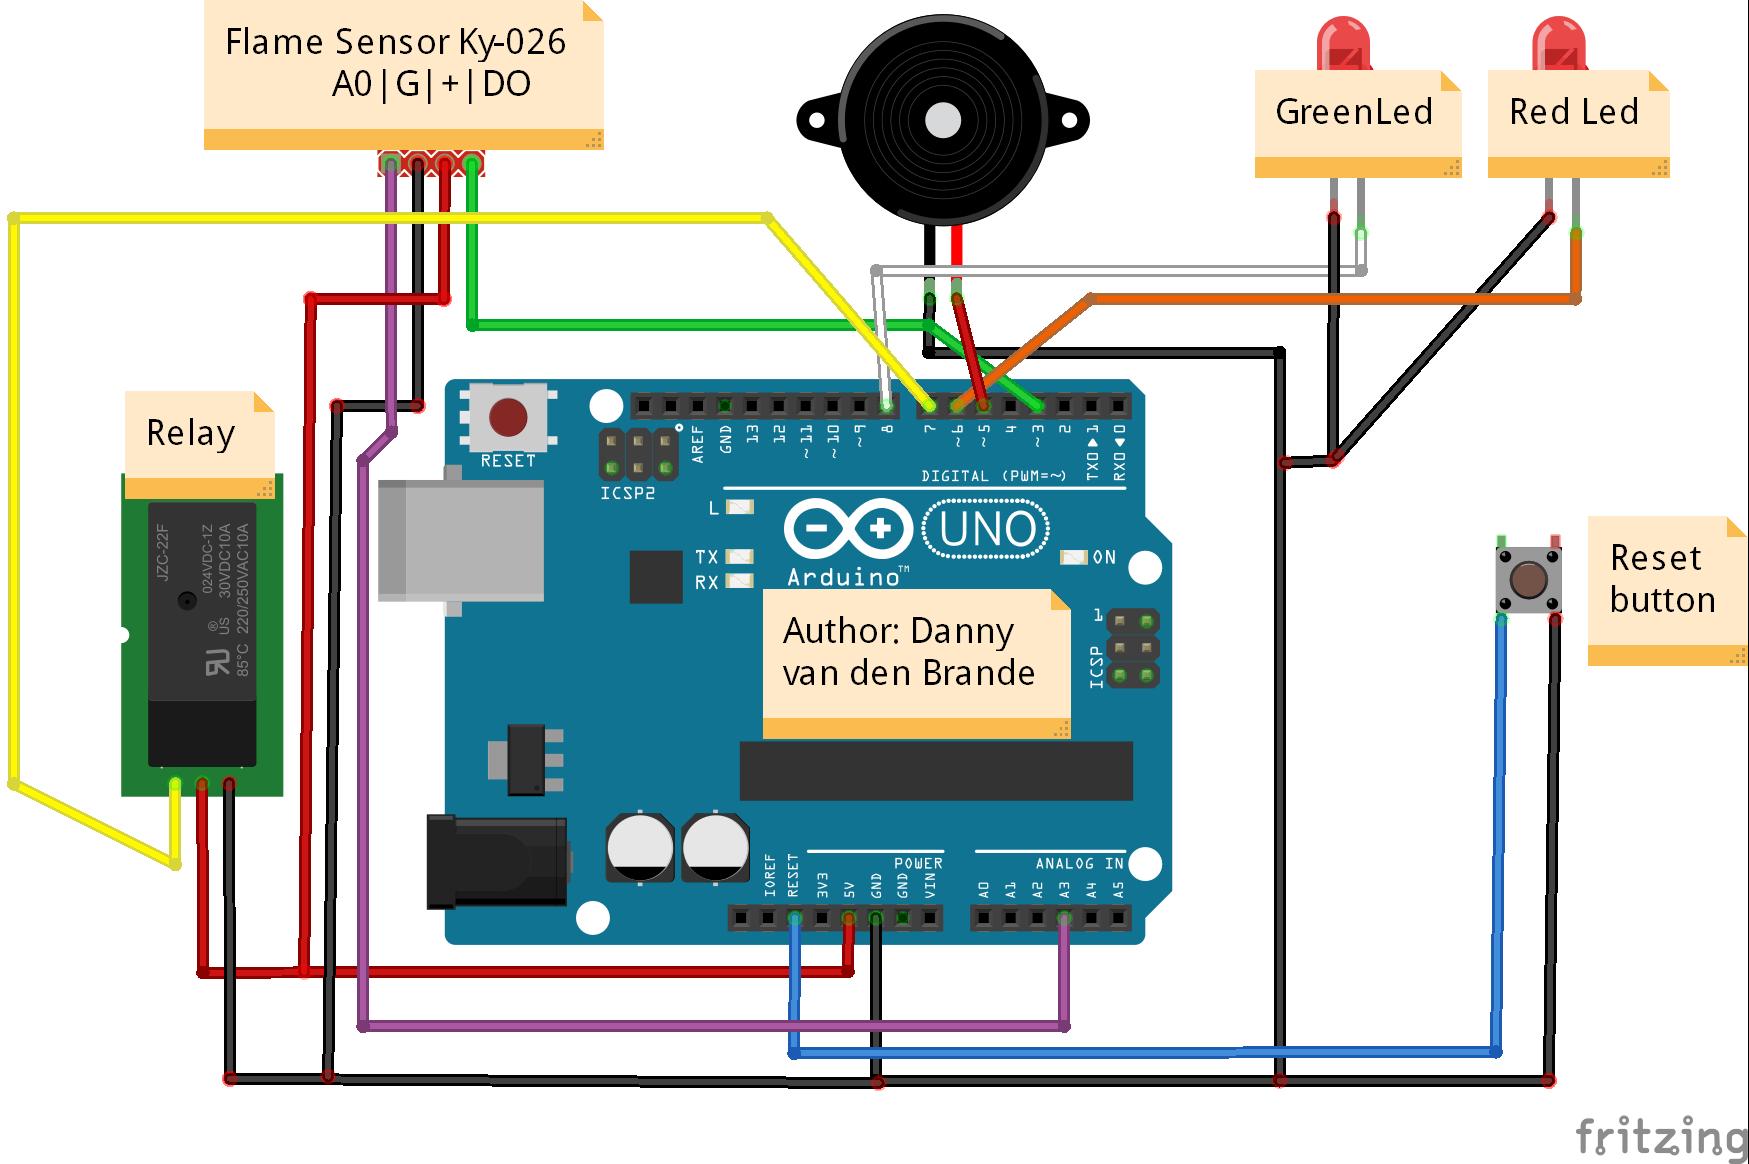 Diy Flame Sensor Alarm Using Ky 026 Hackster Io